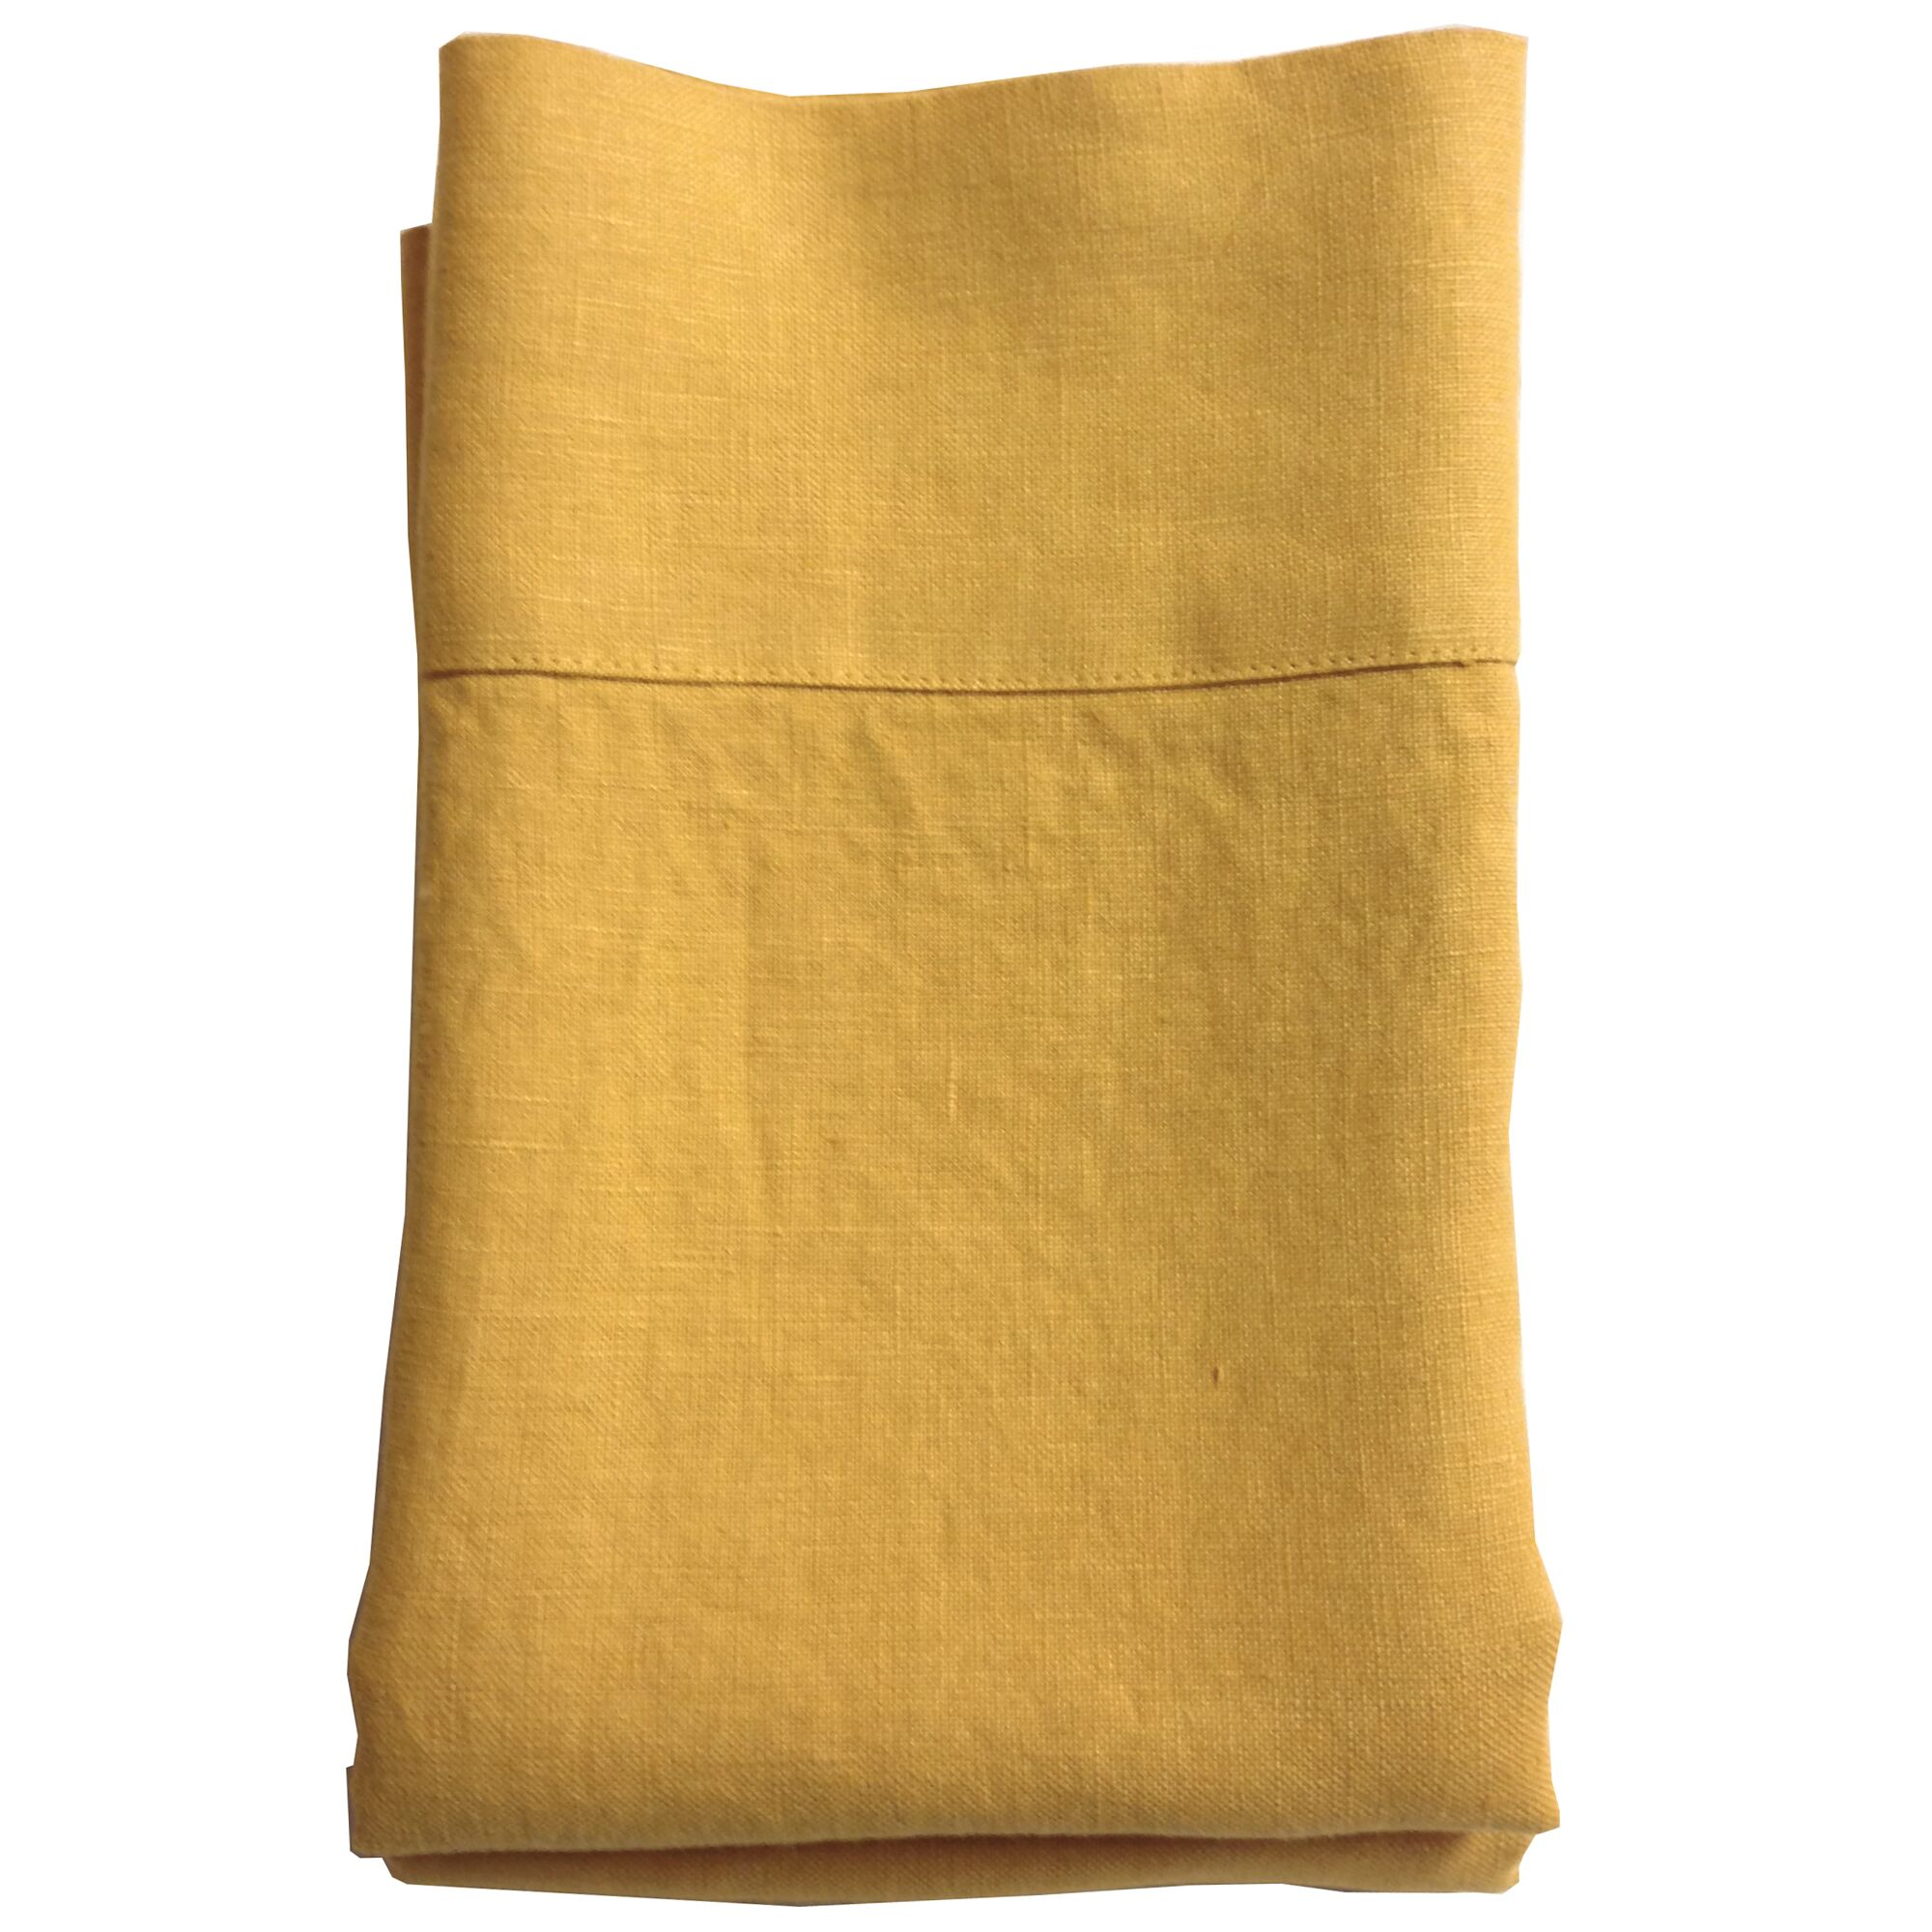 Linen Pillowcase Color: Black, Size: Standard/Queen